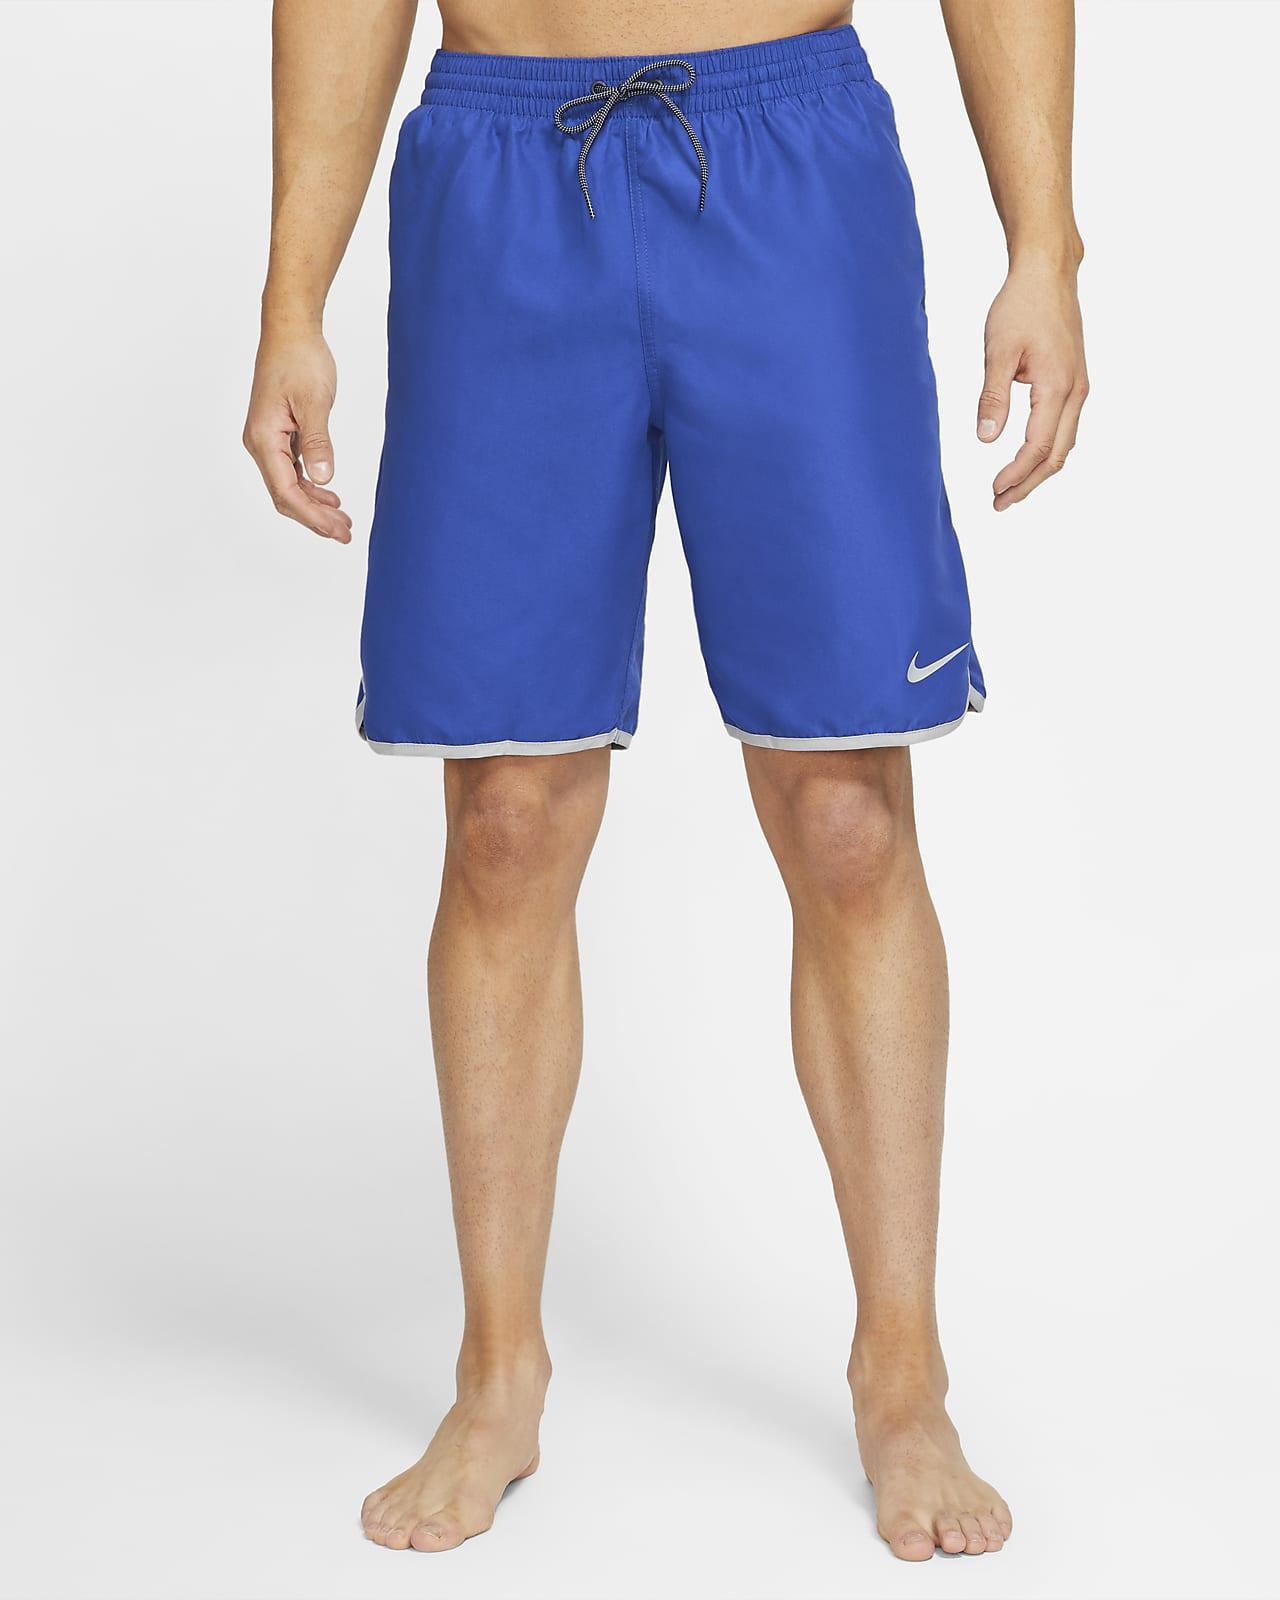 "Nike Diverge Men's 9"" Swim Trunks"